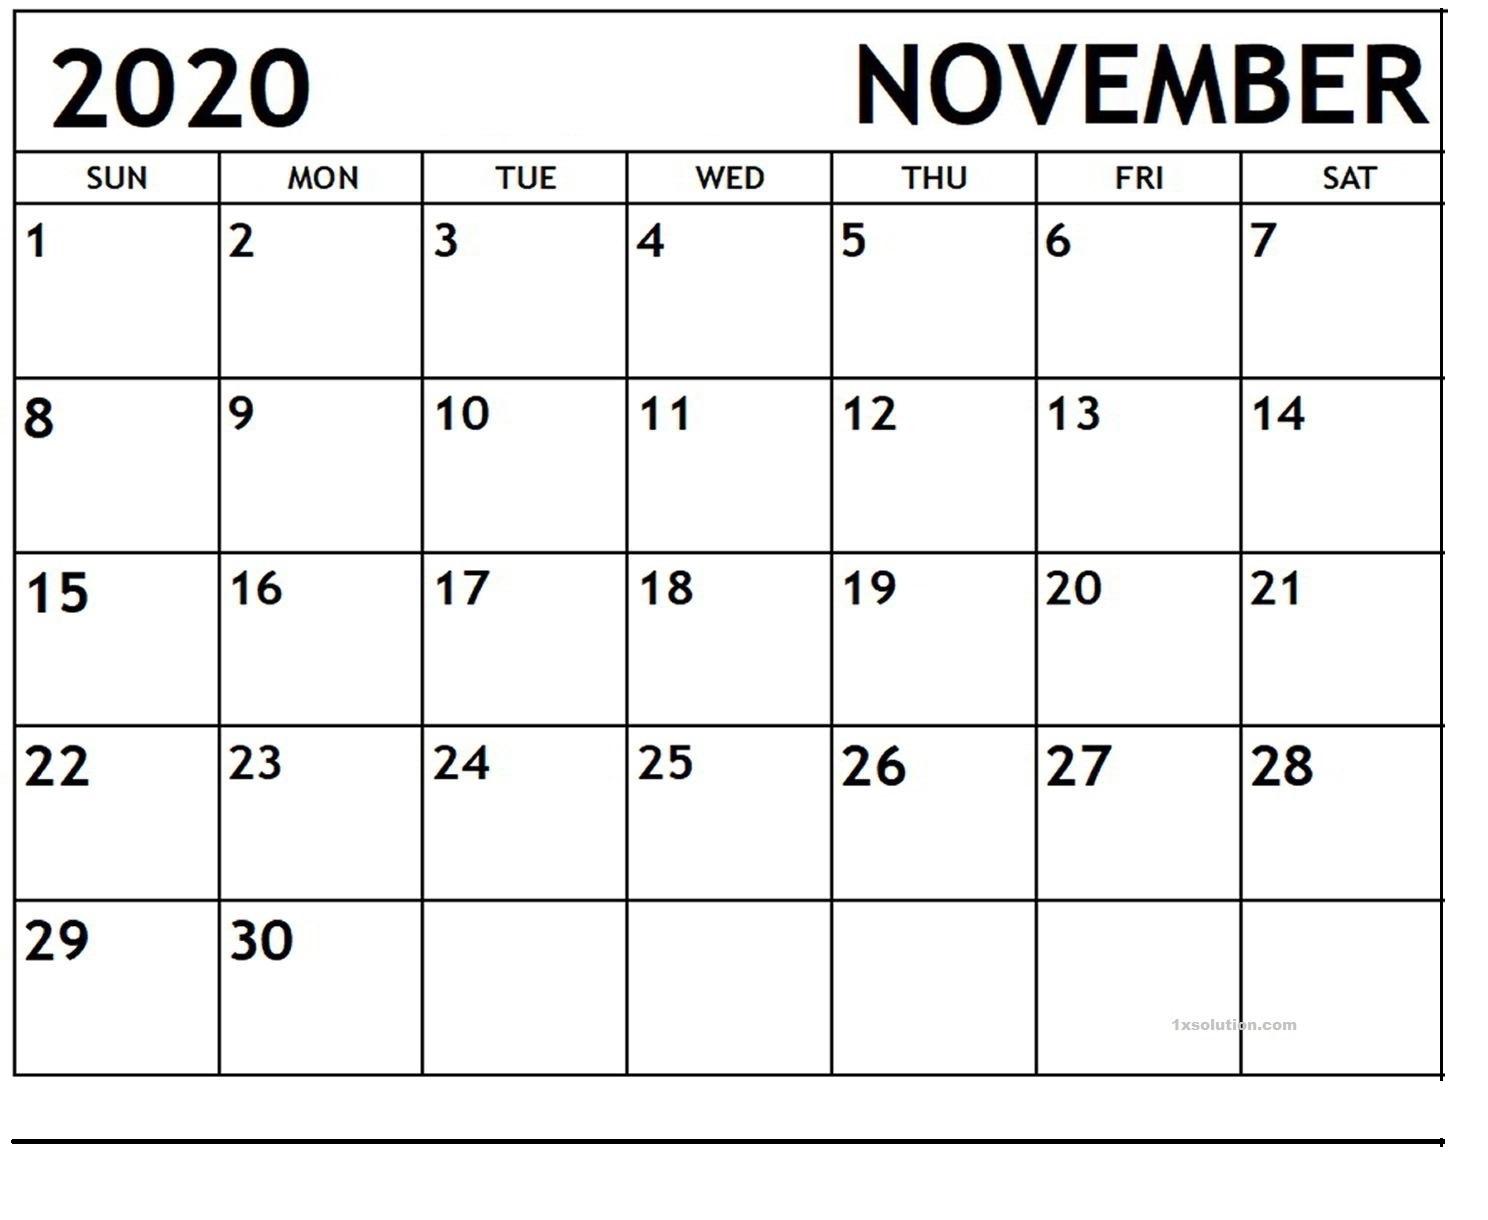 Blank November 2020 Calendar Download